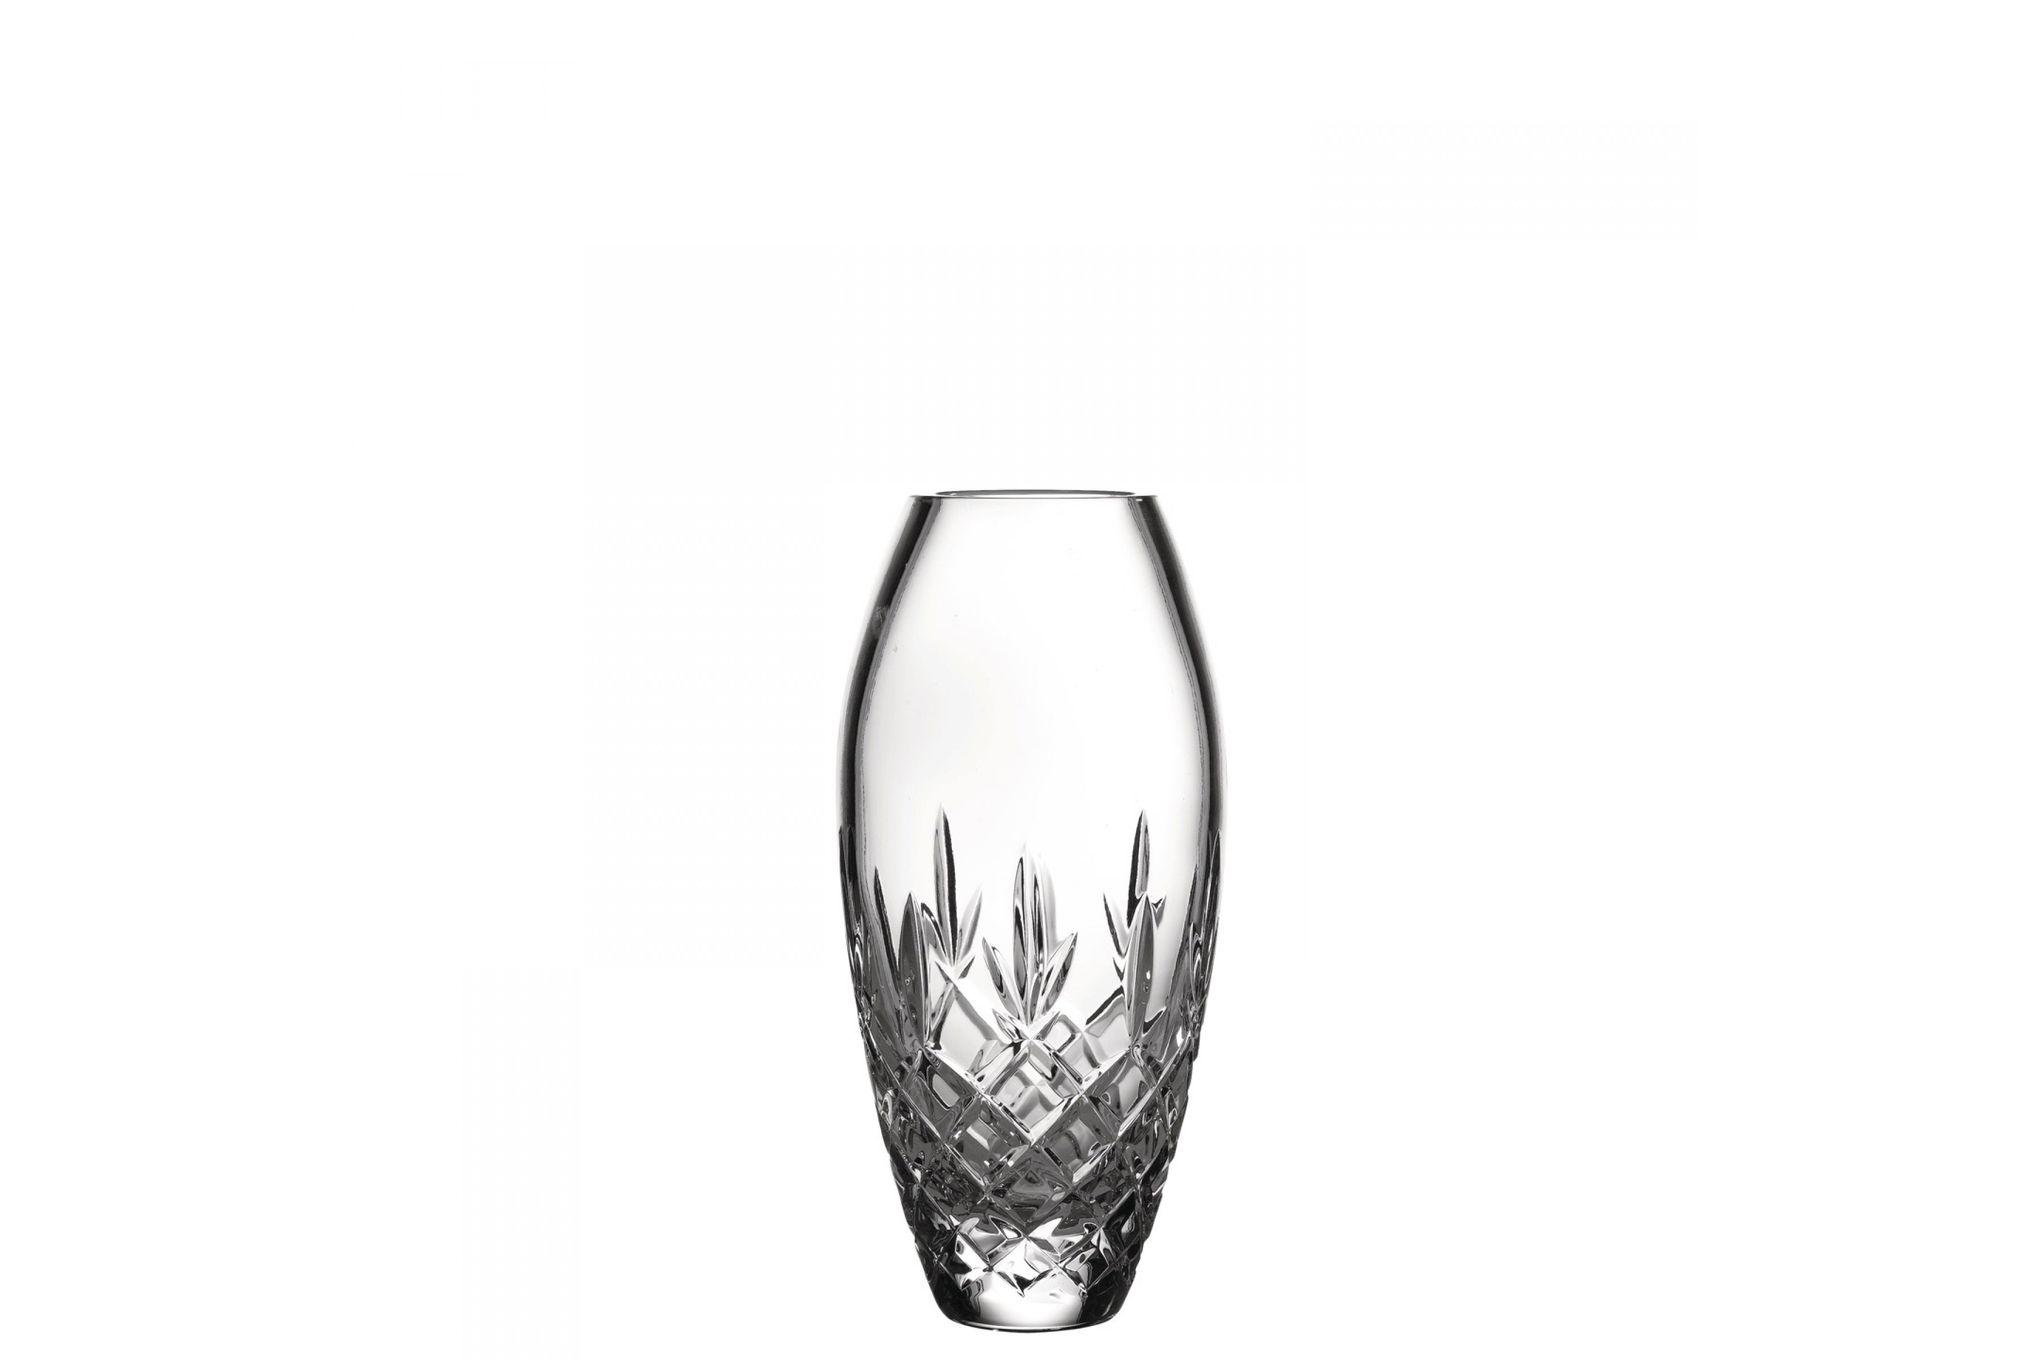 Royal Doulton Dorchester Bud Vase Boxed 18cm thumb 1